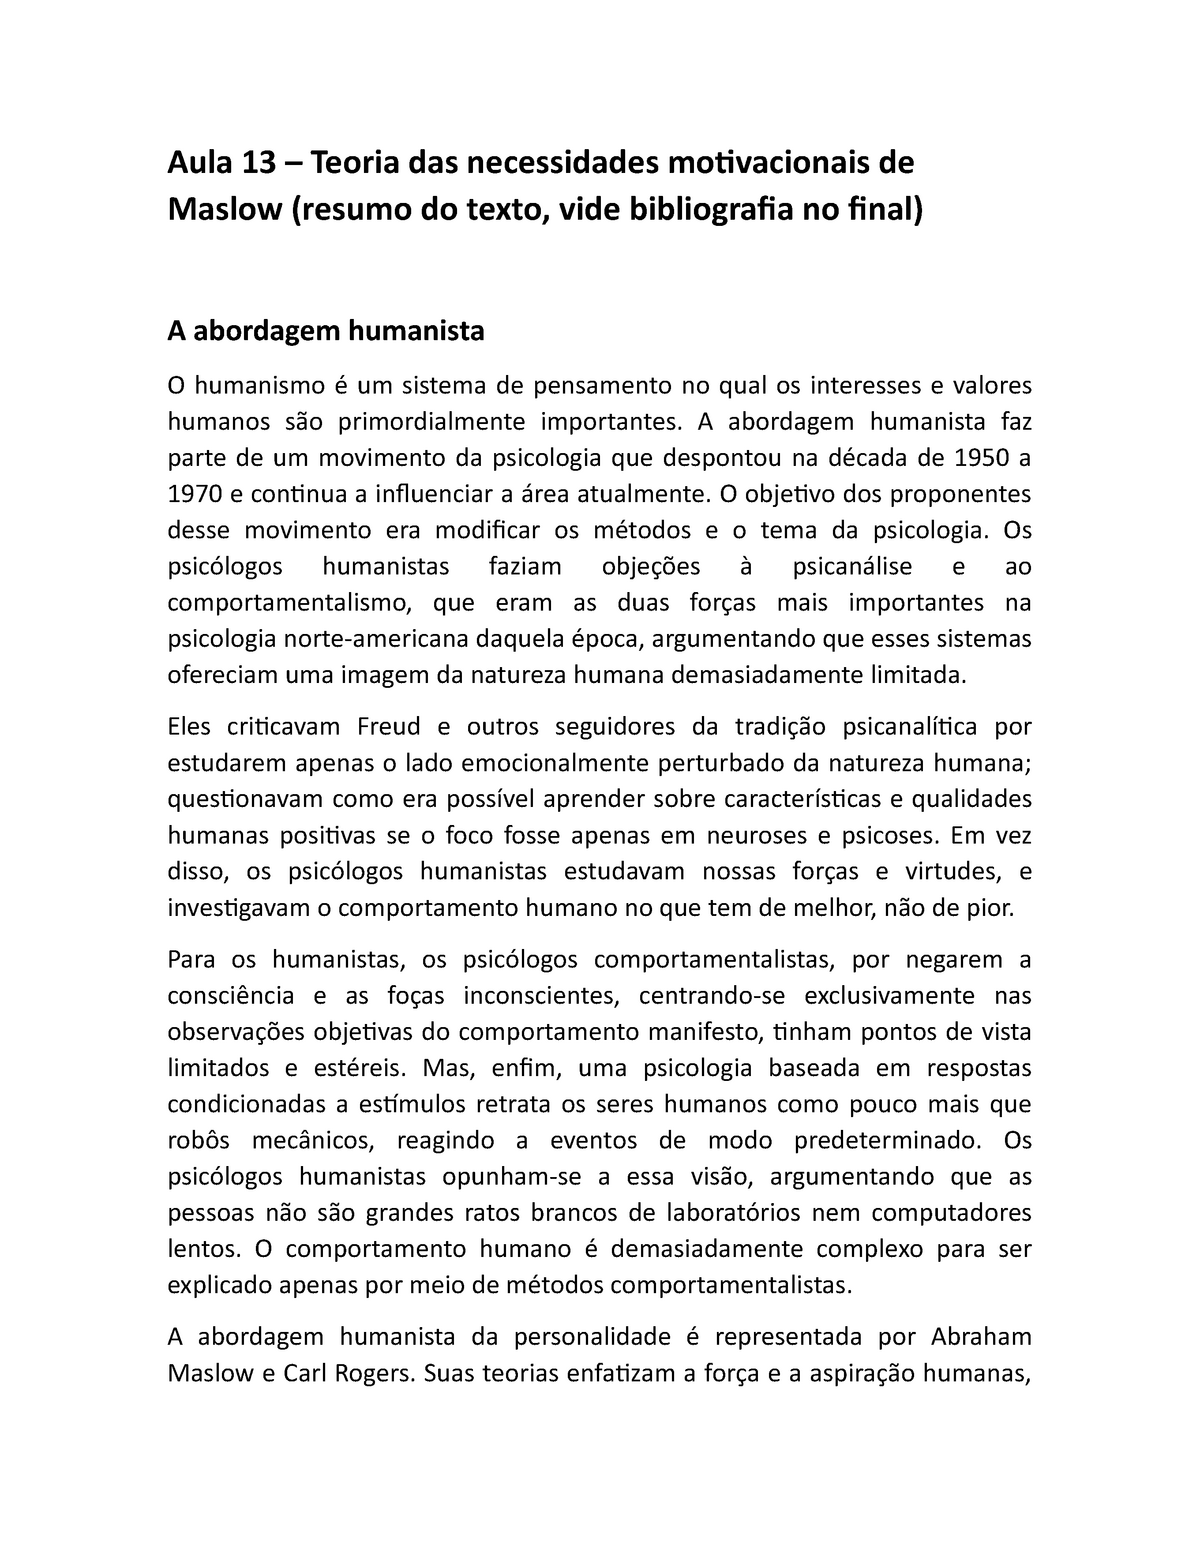 Summary 18 Nov 2018 Studocu